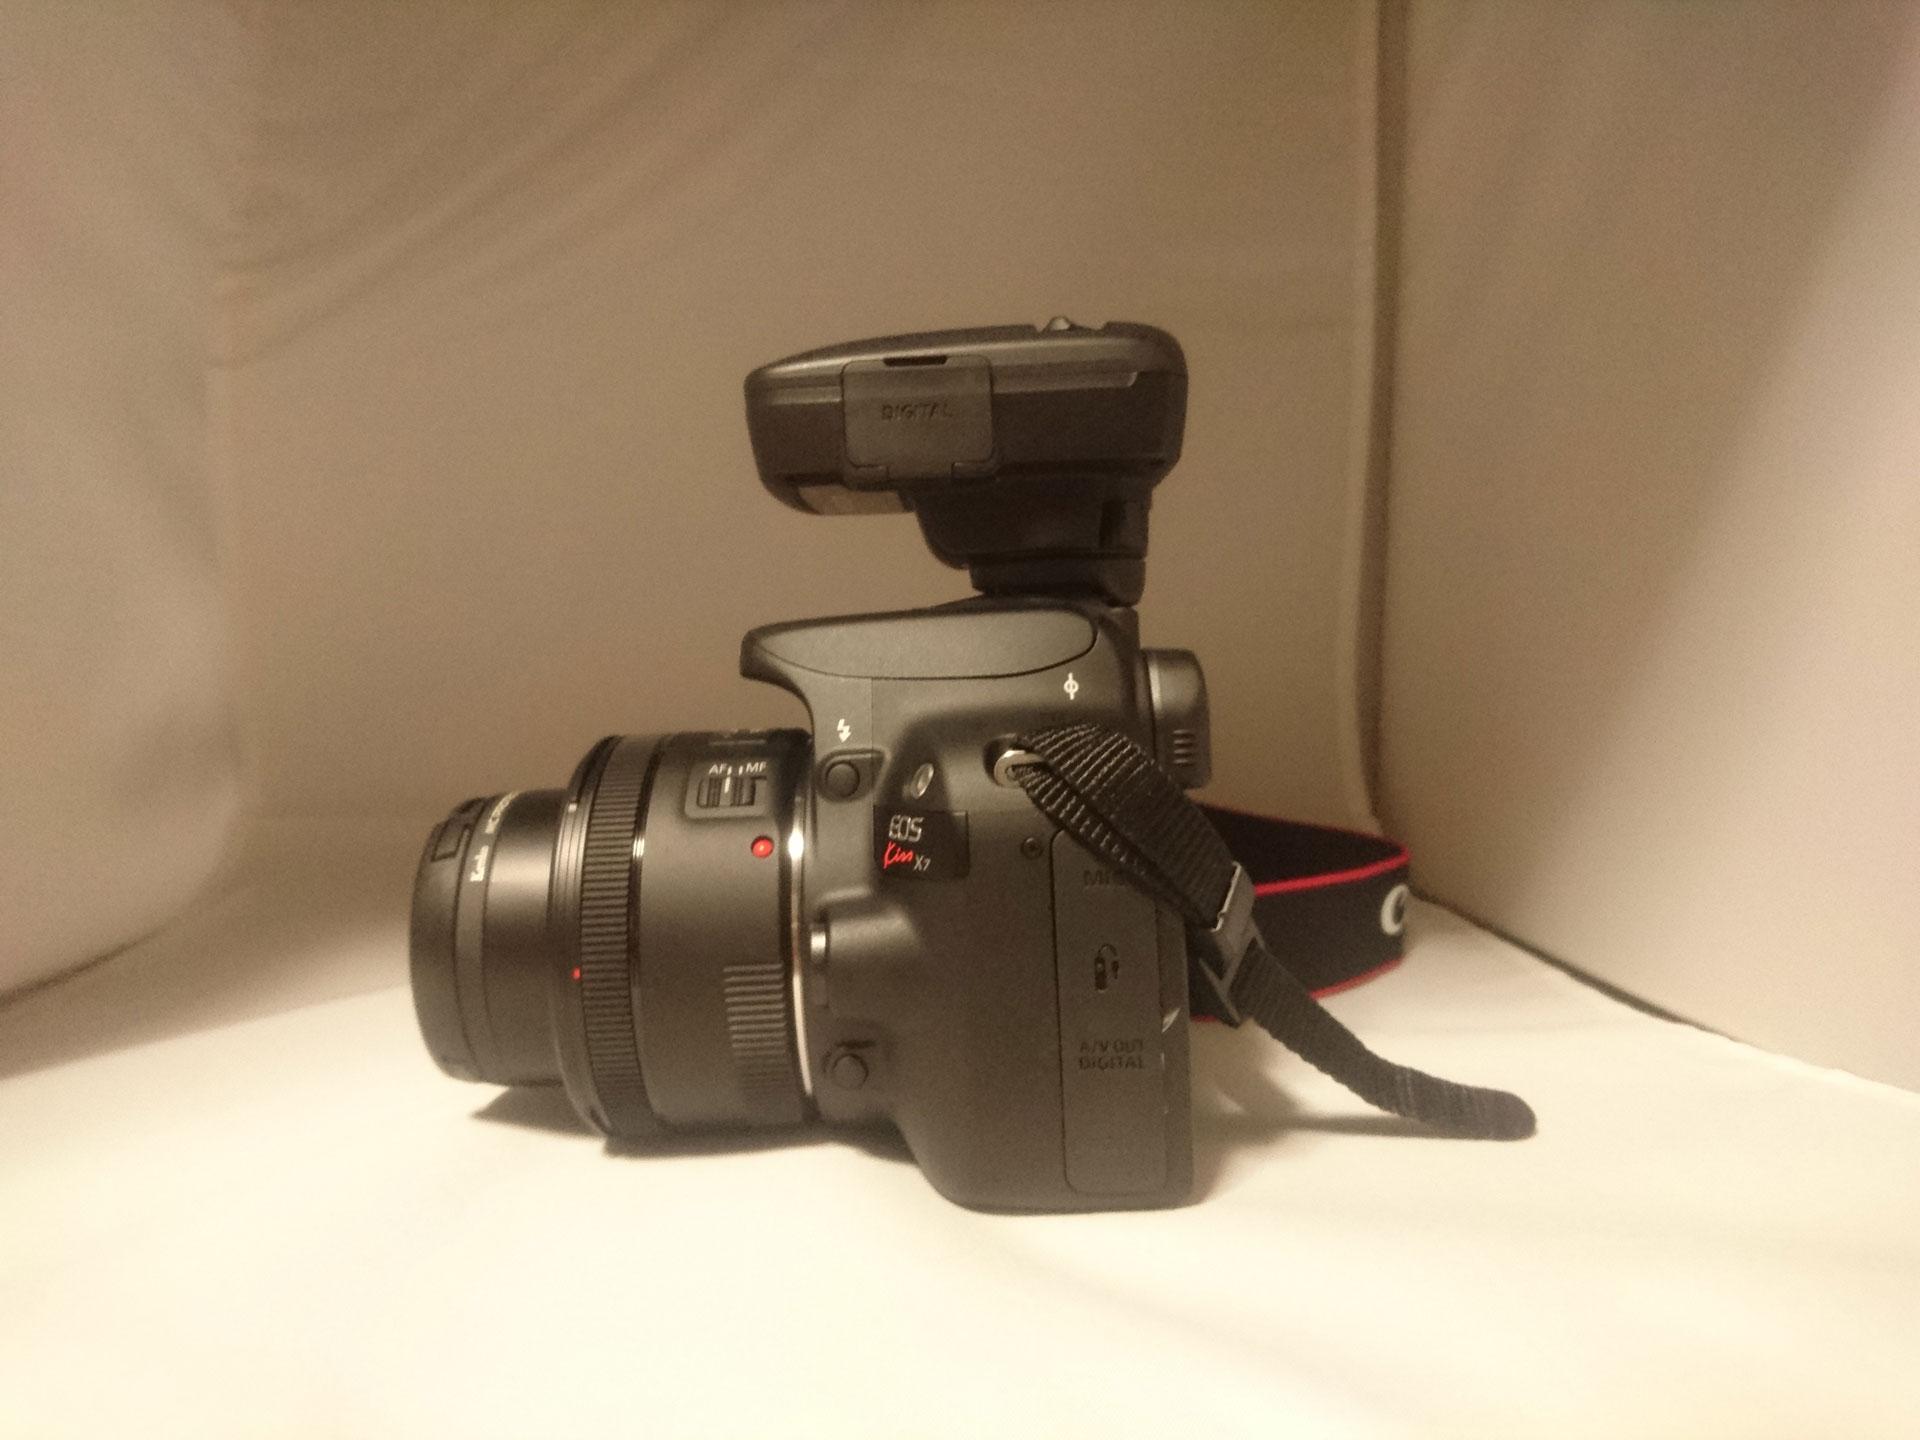 Canon Eos Kiss X7 and GP-E2 側面